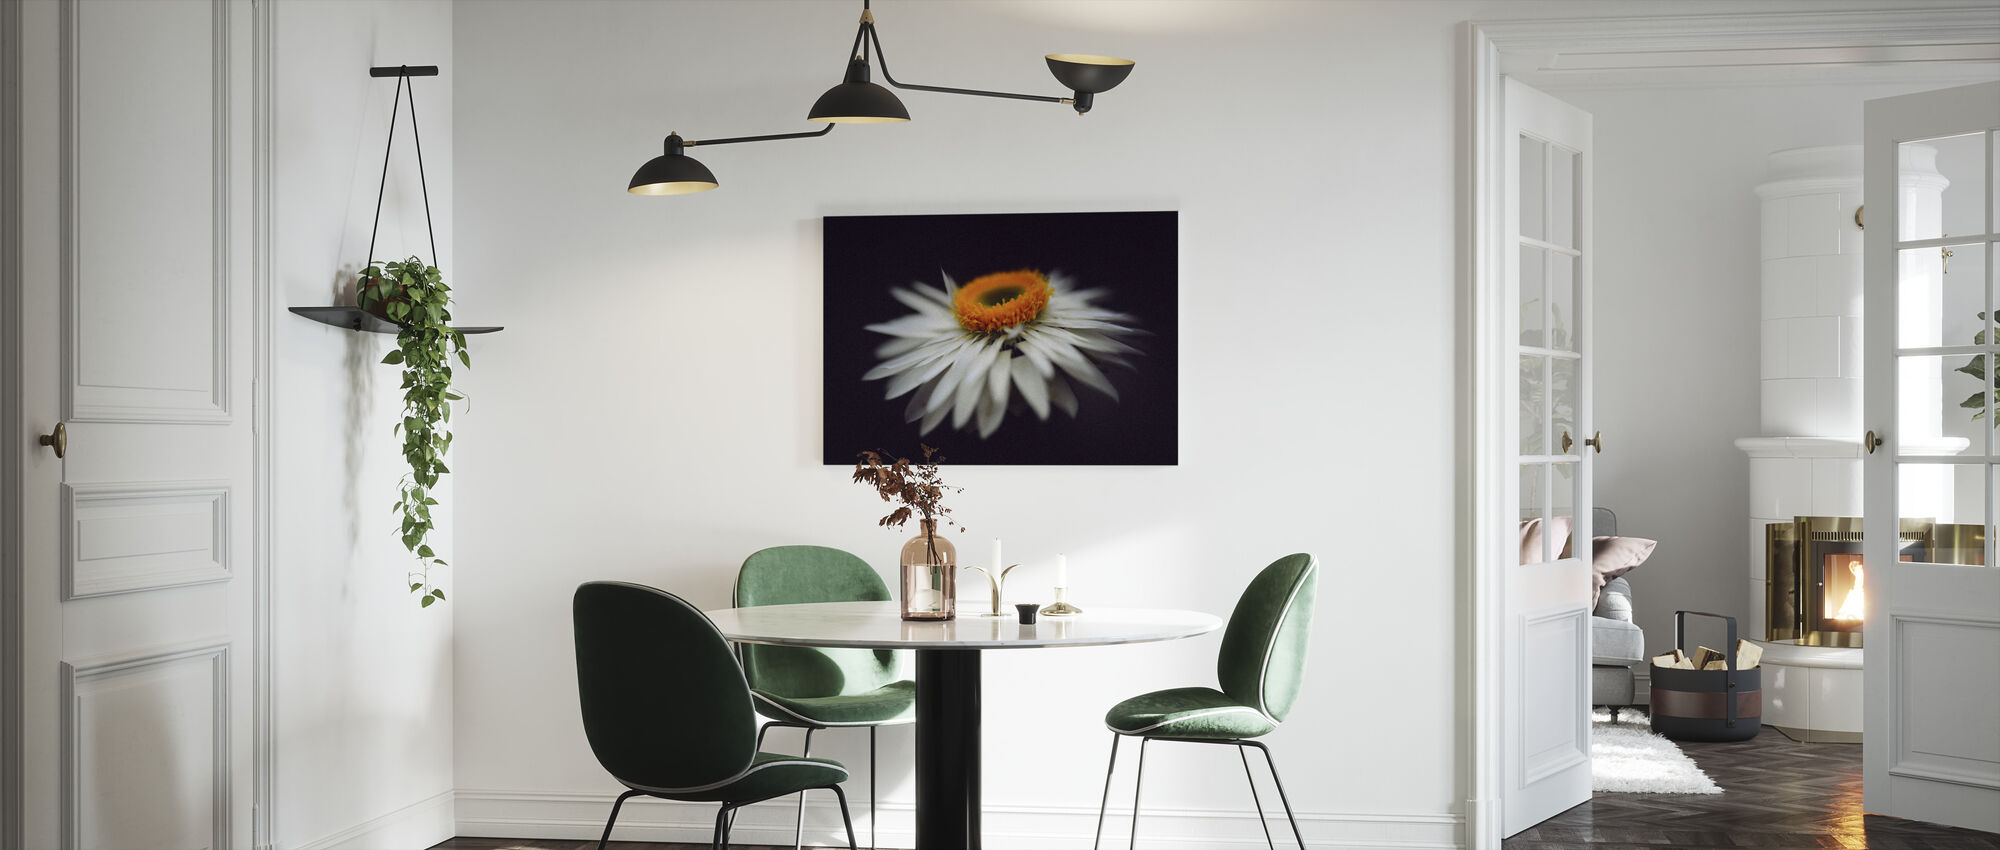 Magnific Flower - Canvas print - Kitchen